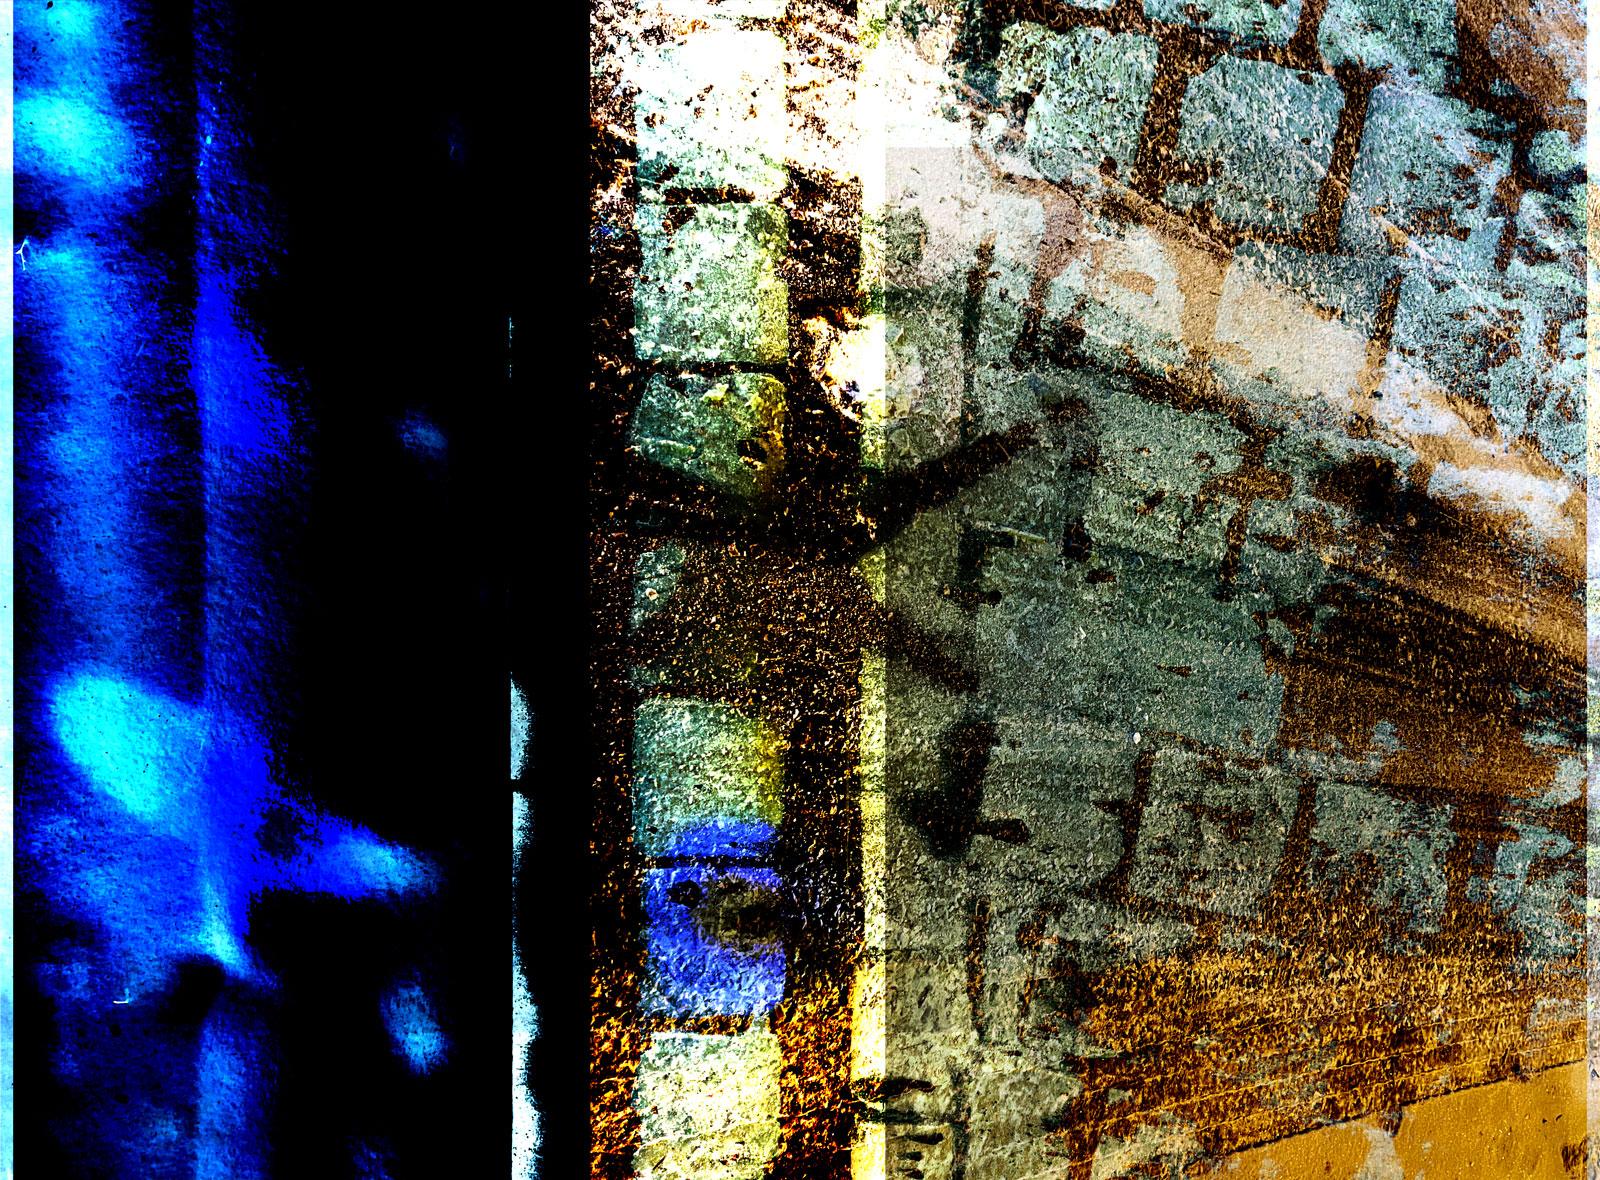 Elemental Frost N08 - Radiant • 122 x 90 cm (48.03 x 35.43 in)